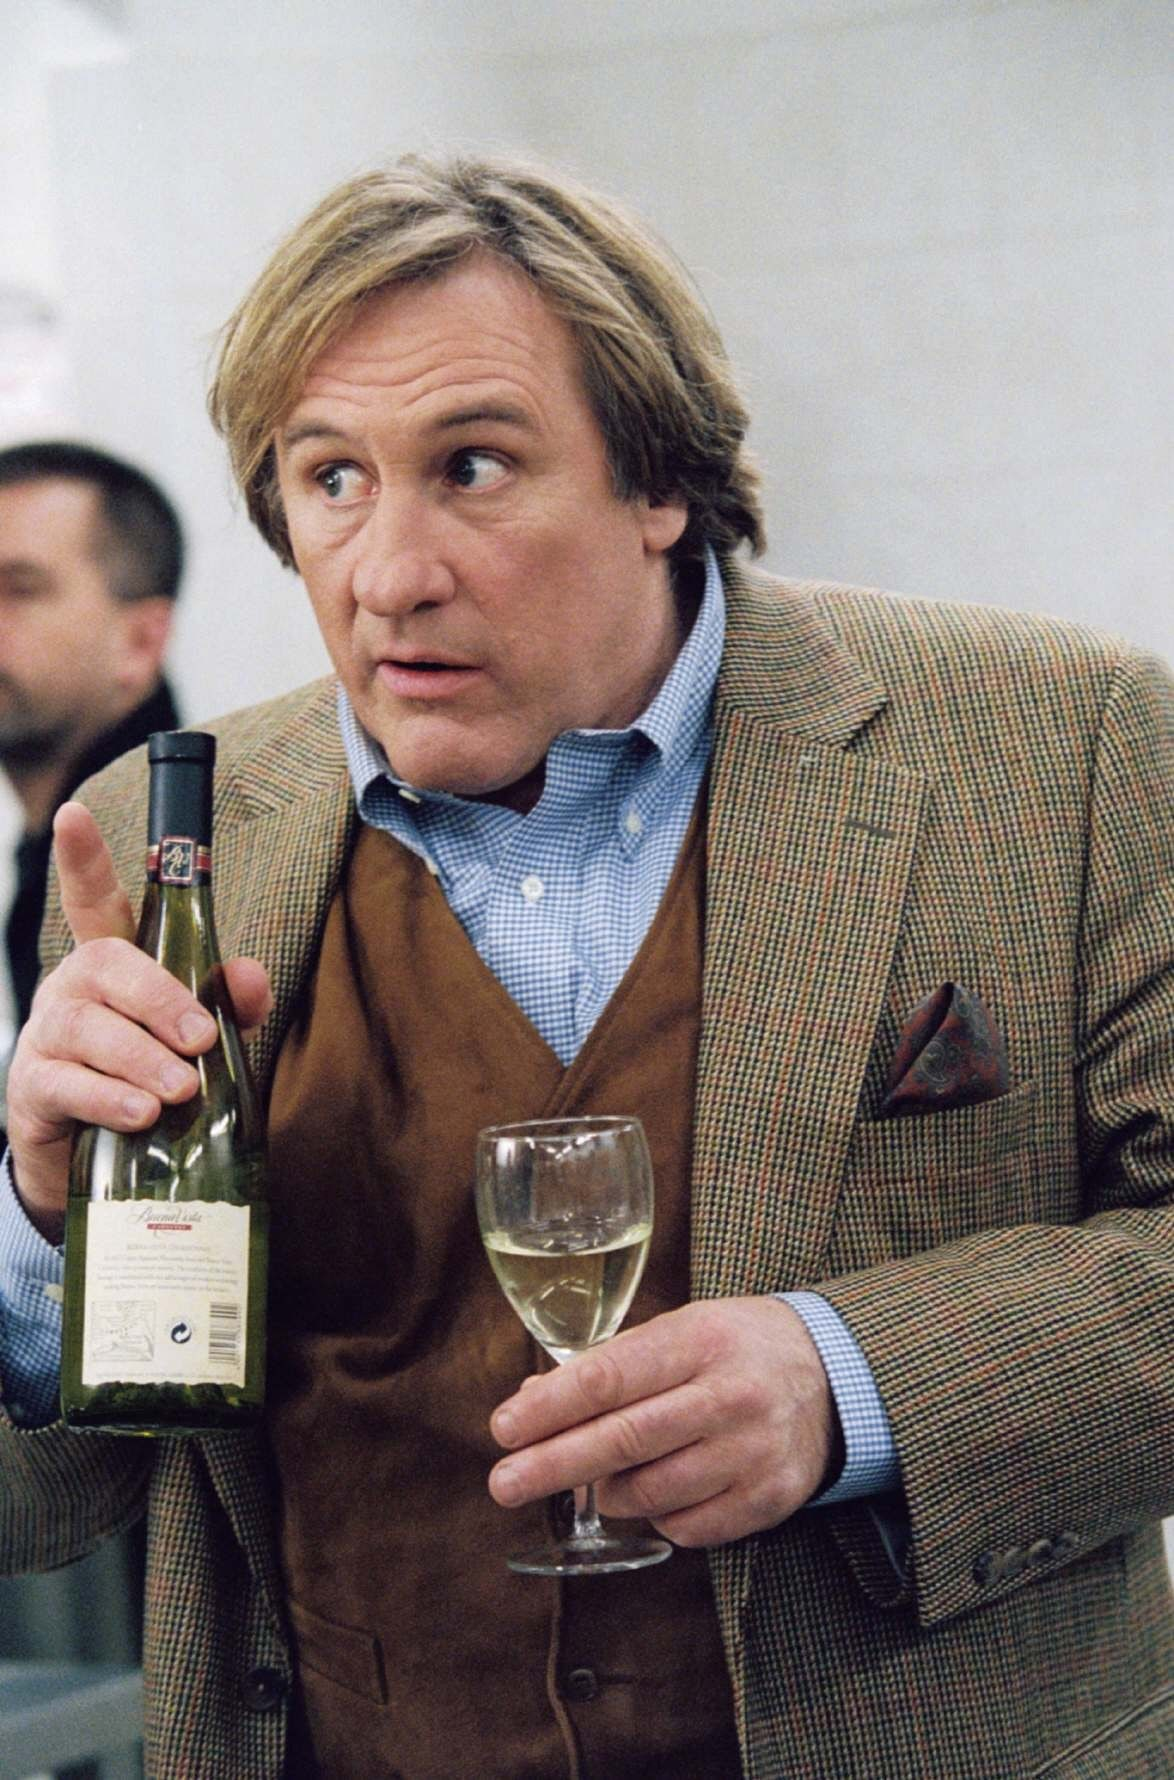 Gerard Depardieu For mobile